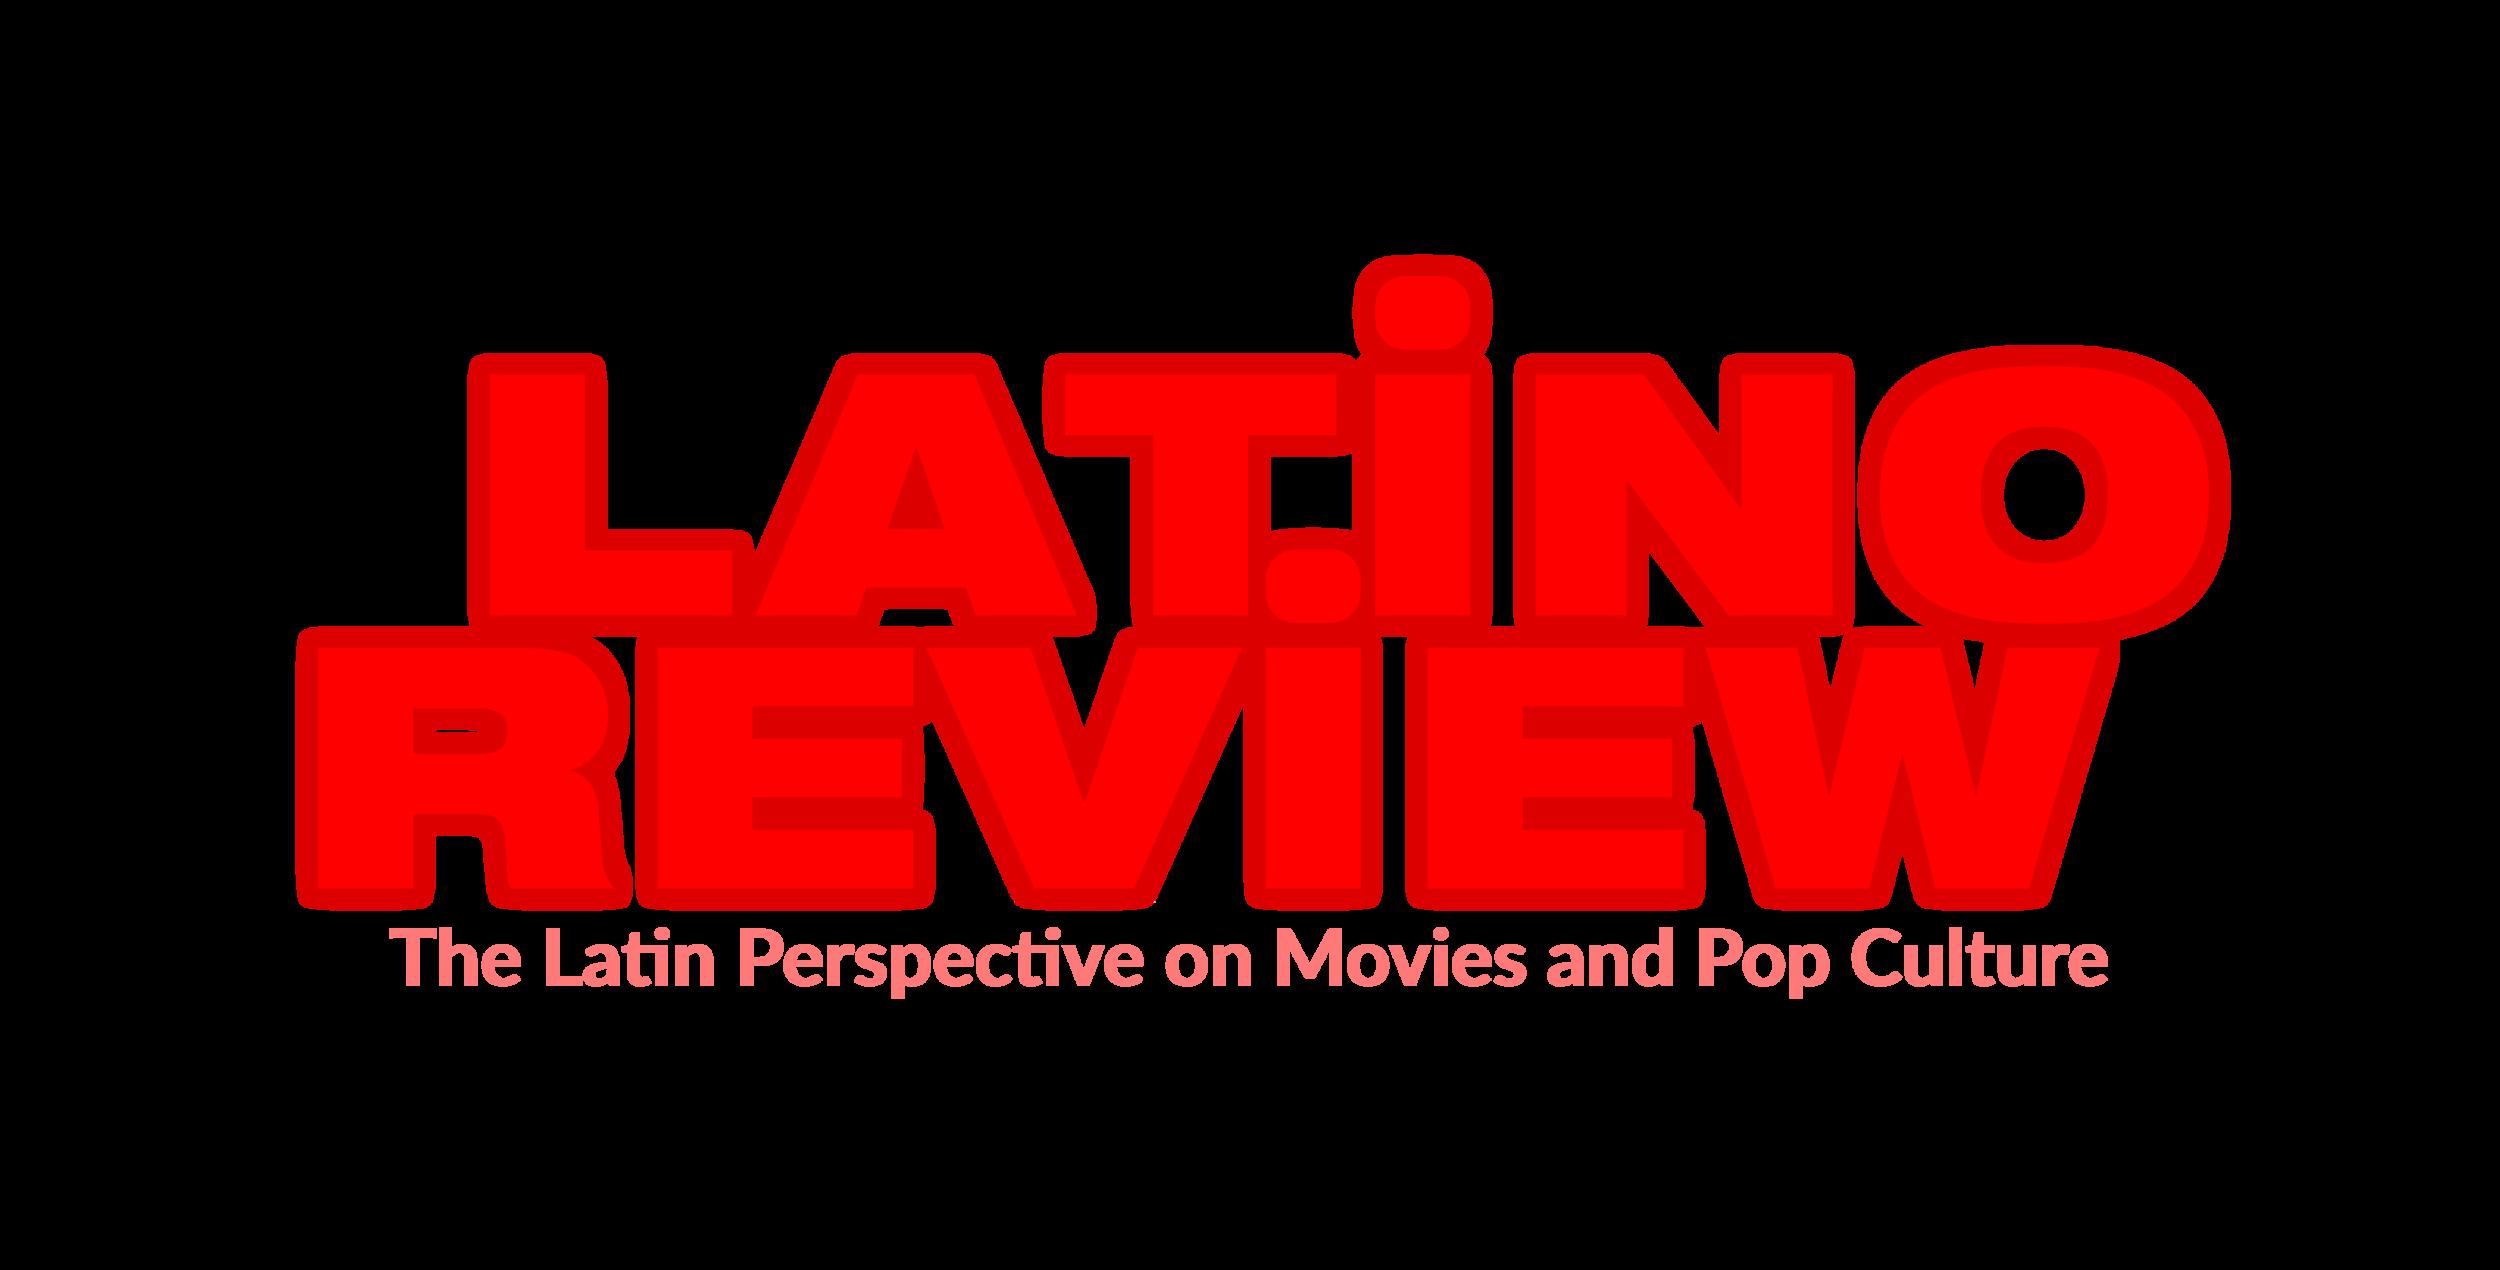 latino-review-logo.png